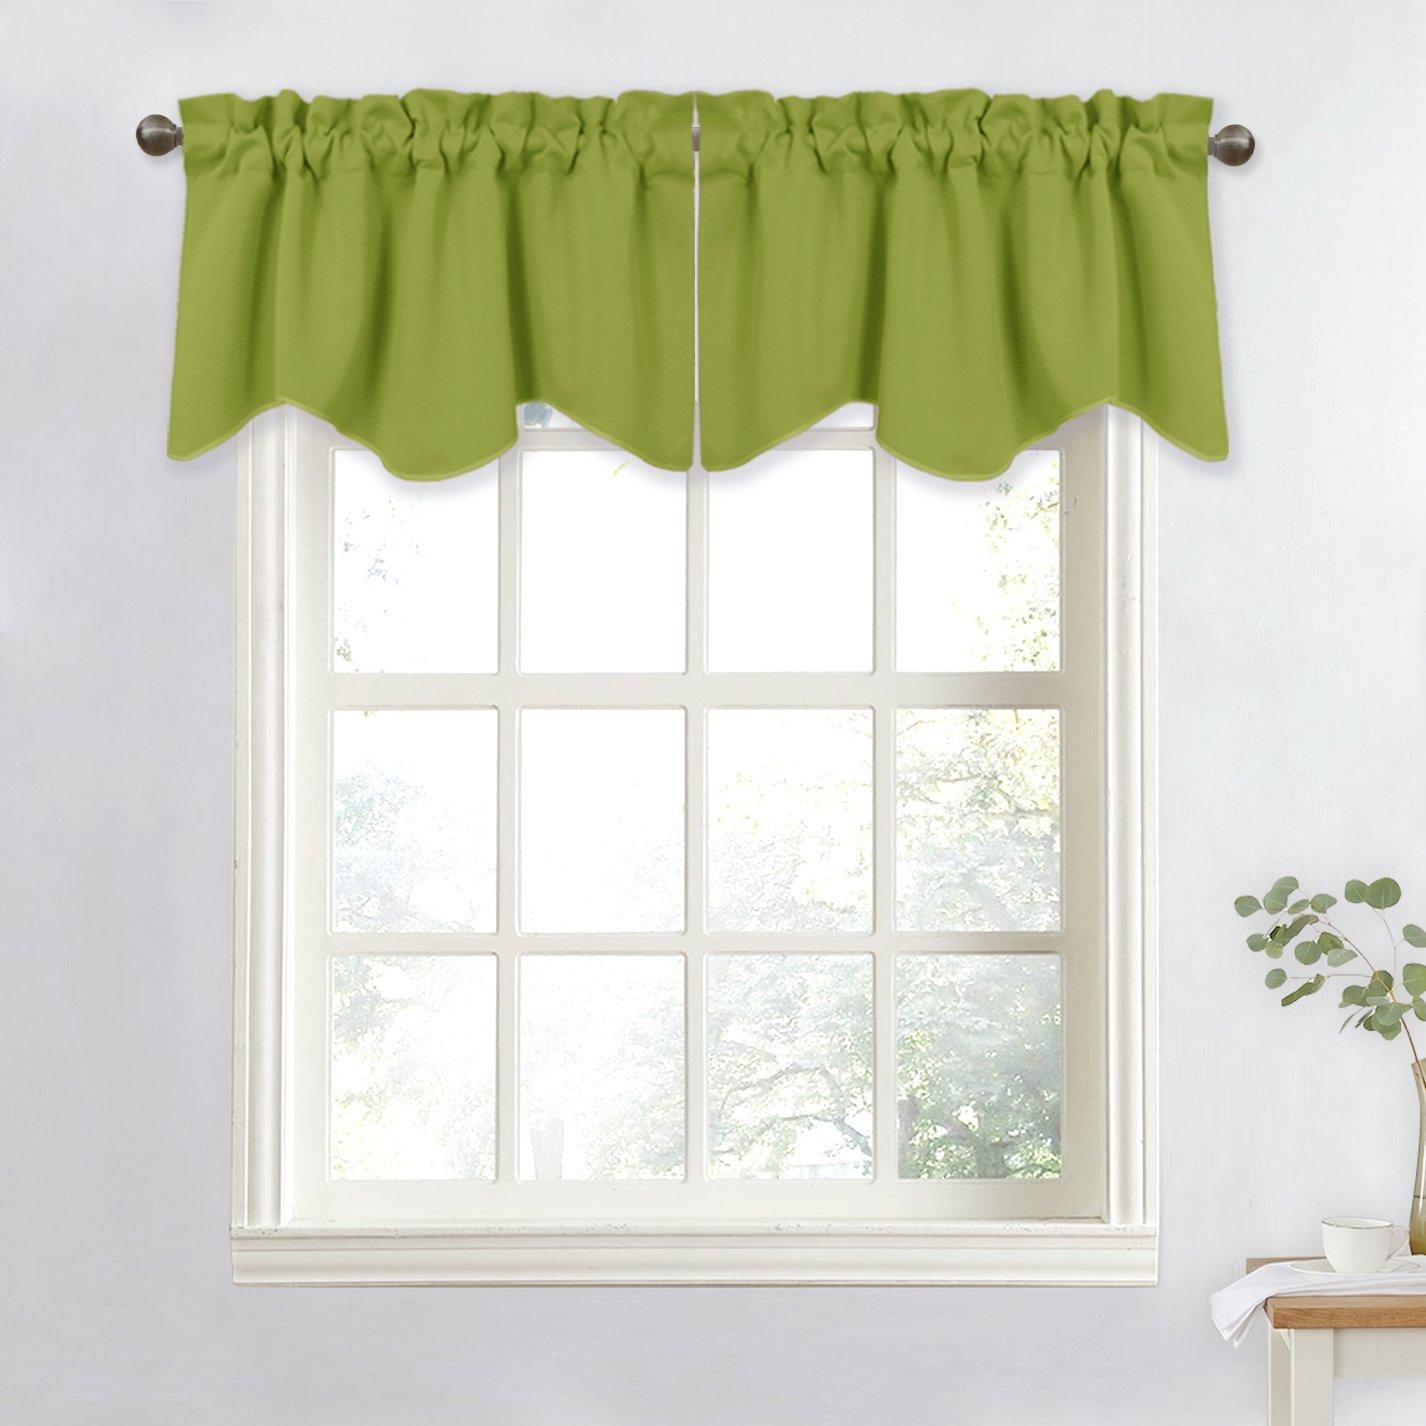 NICETOWN Window Treatment Room Darkening Valance - Kitchen Curtain 52-inch by 18-inch Scalloped Valance (Green, 1 Panel)